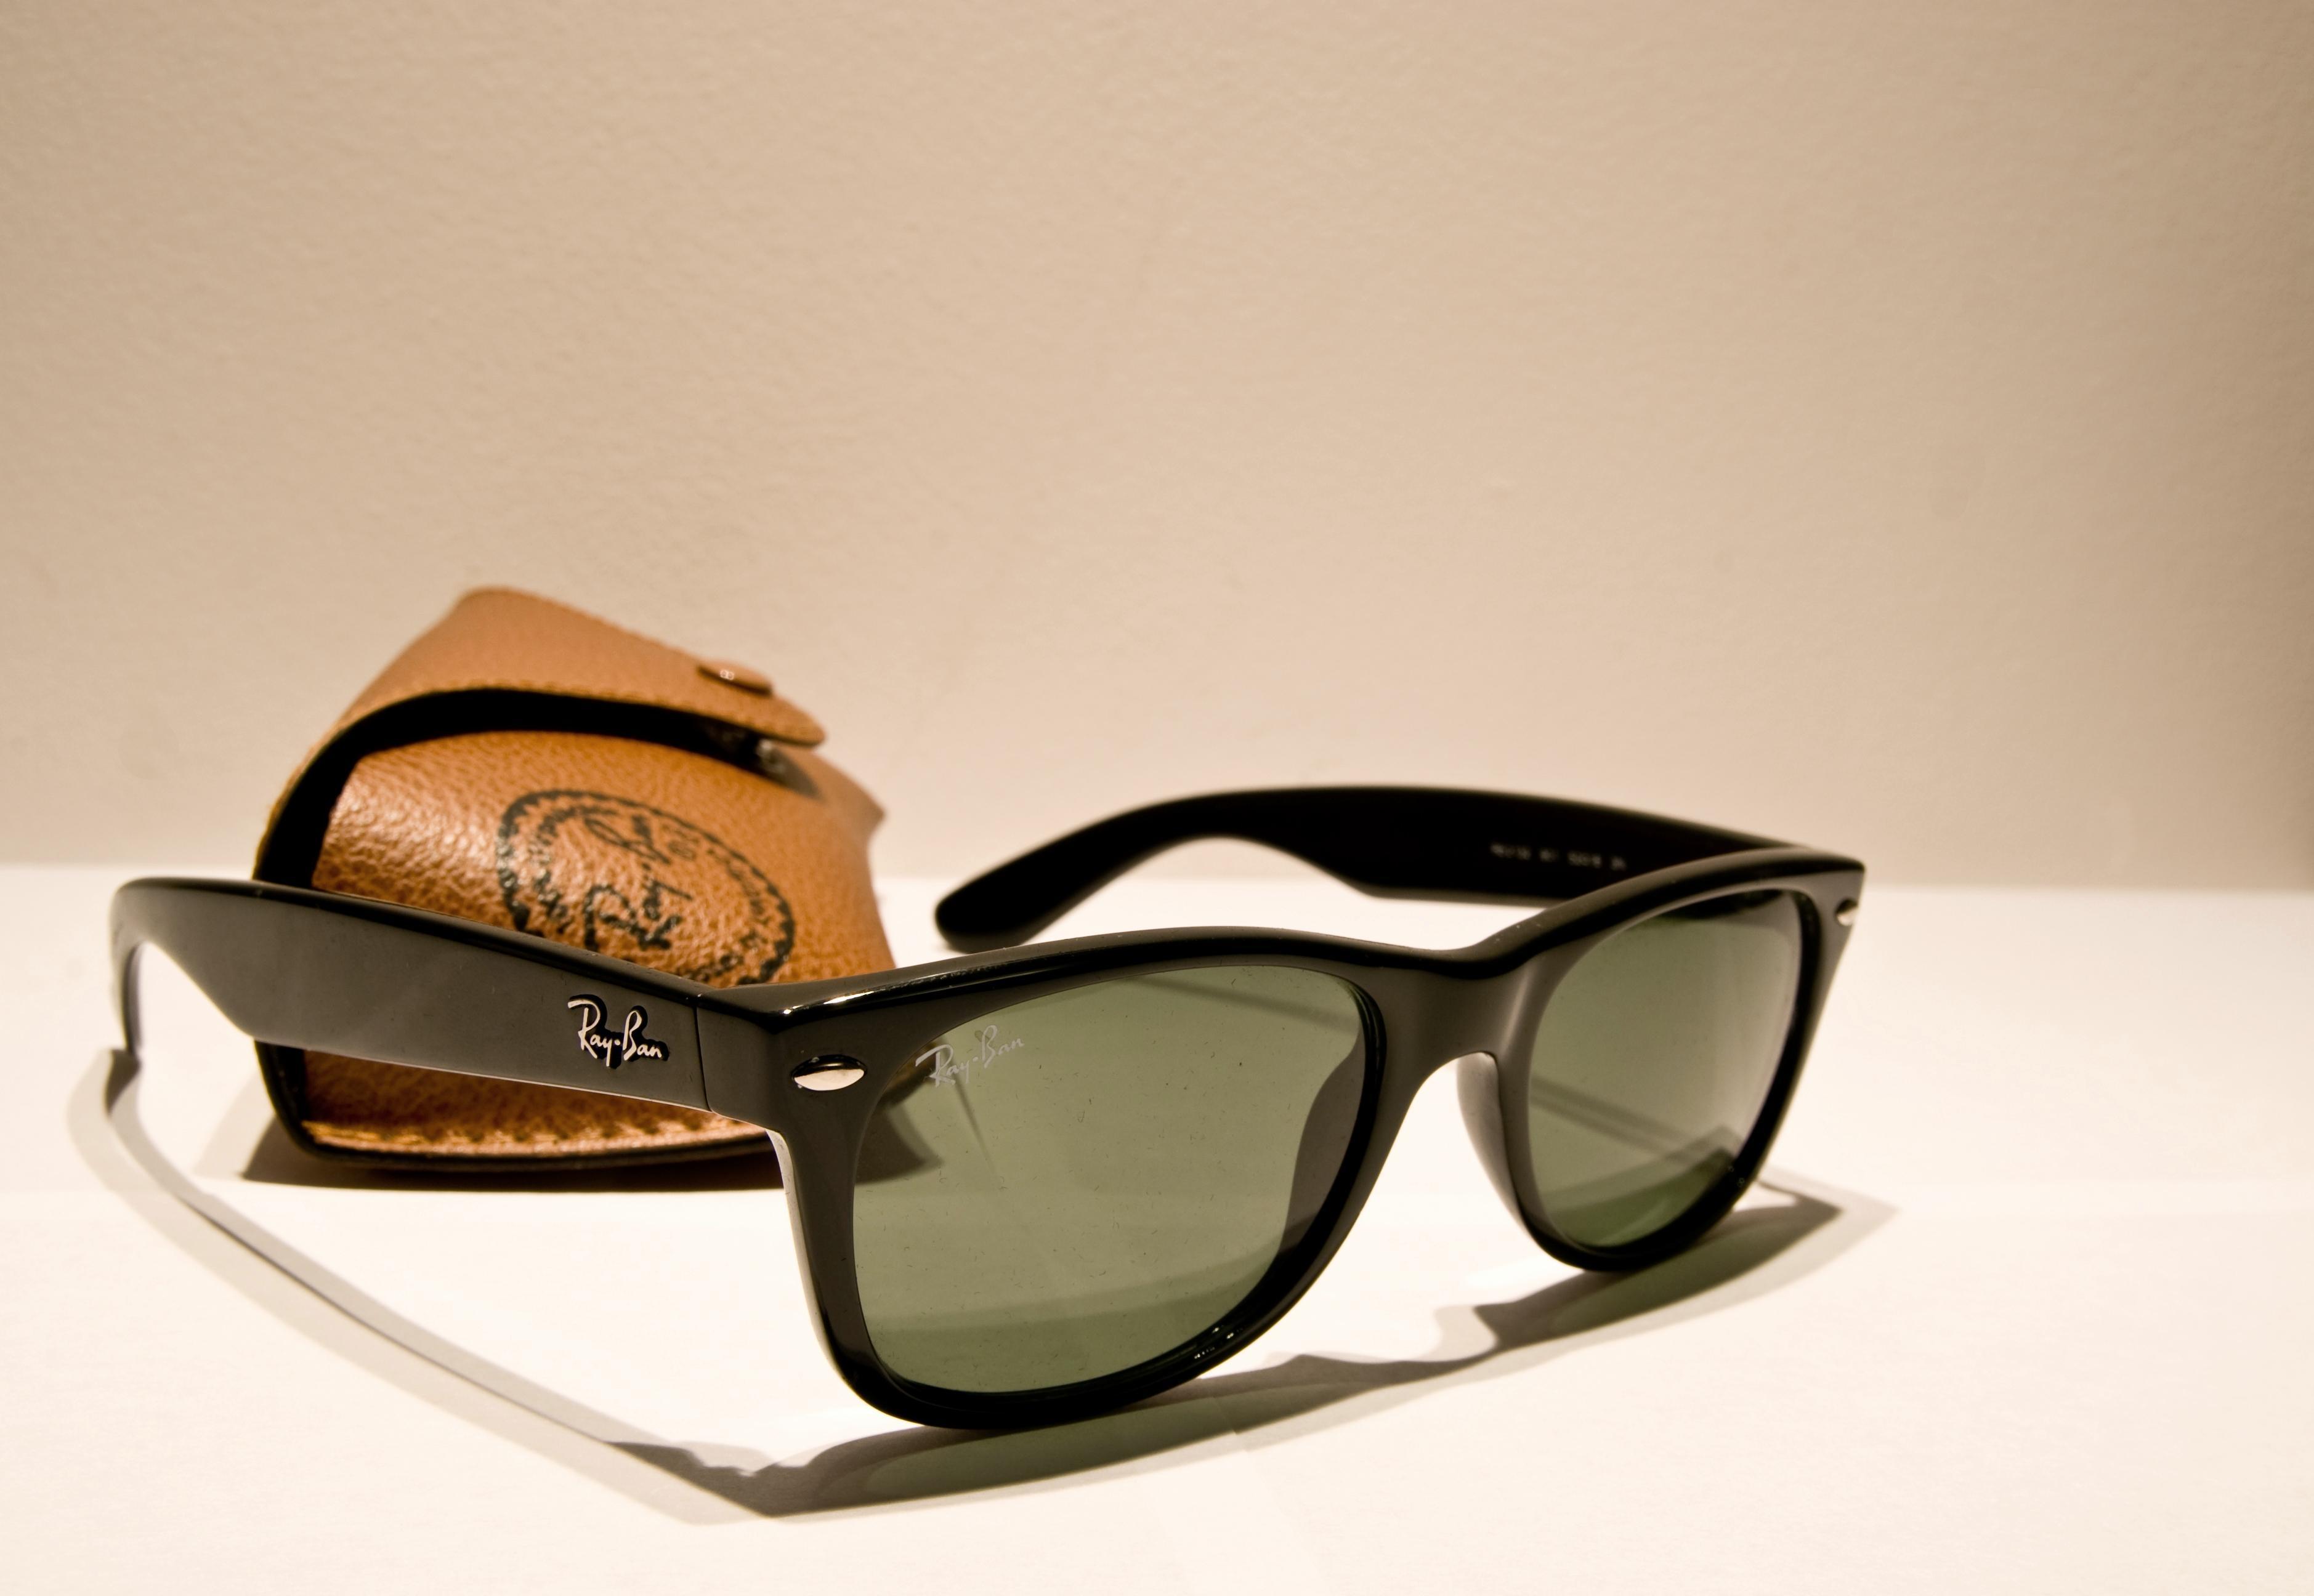 4895a5fd7a Ray Ban Sunglasses Tumblr « Heritage Malta